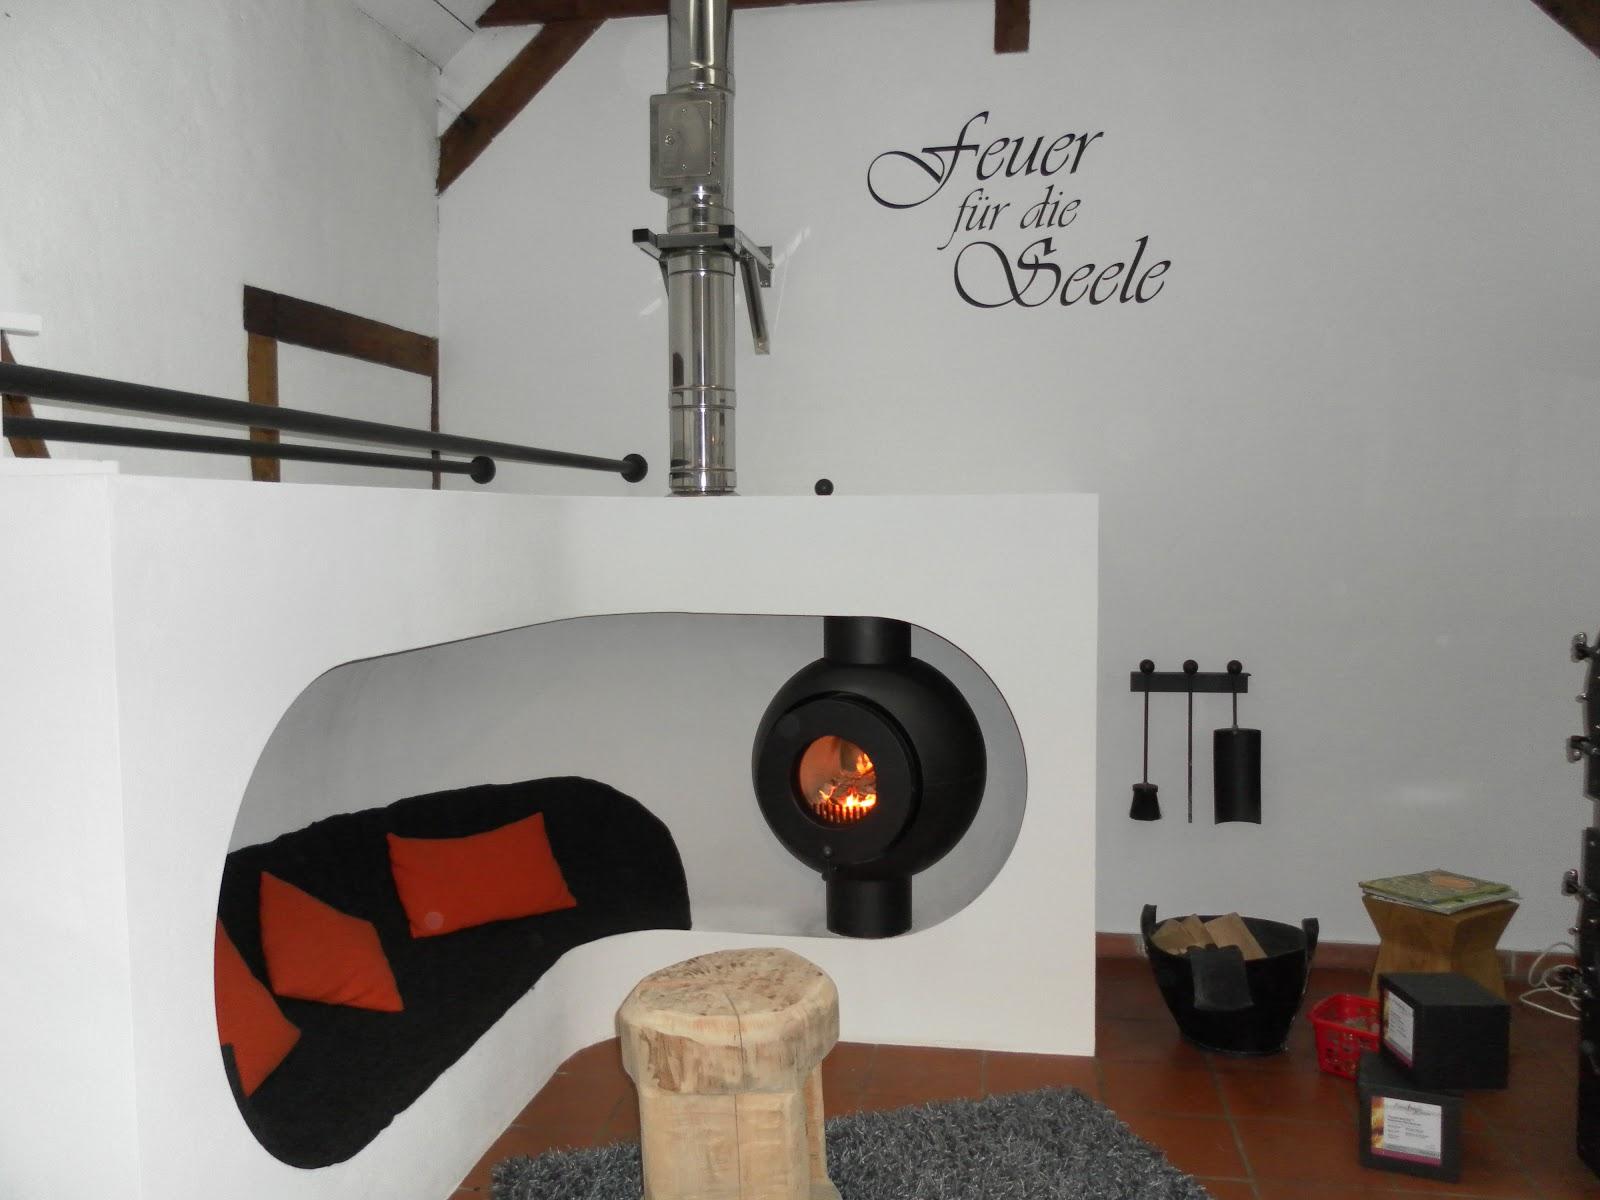 kaminstudio anselment blog m rz 2013. Black Bedroom Furniture Sets. Home Design Ideas